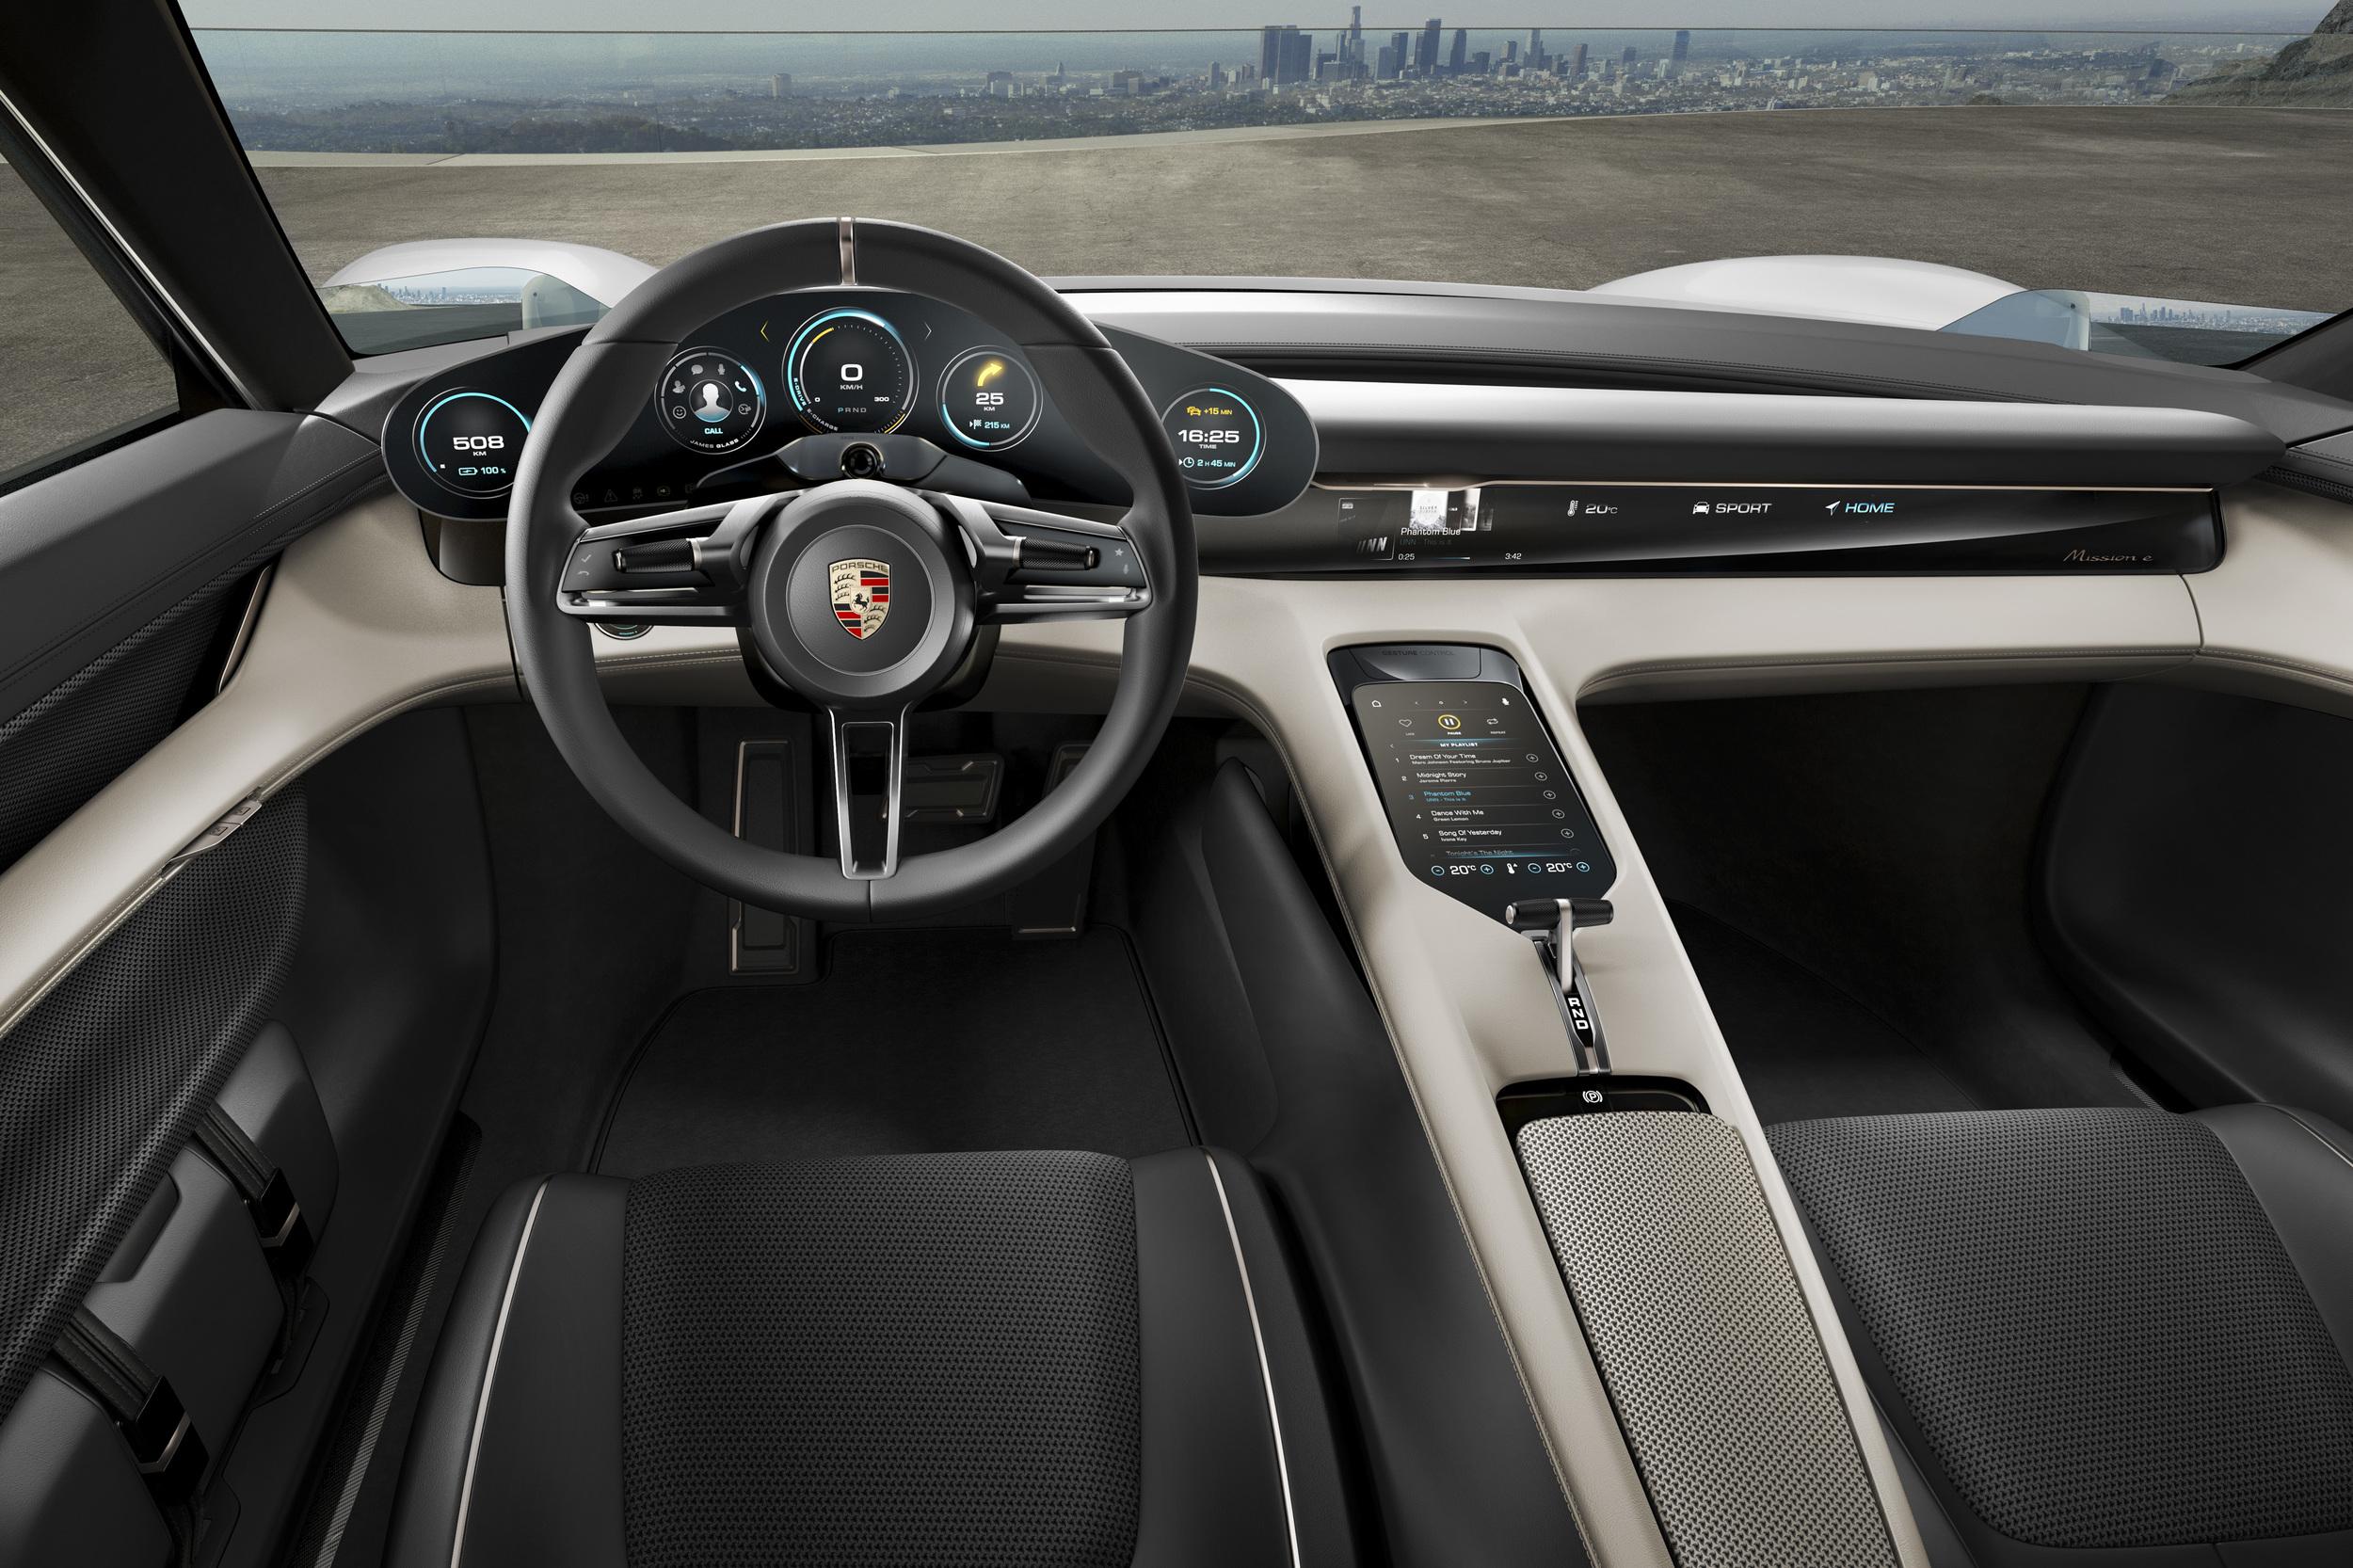 porsche mission e concept 2015 interior - Porsche 2015 Interior